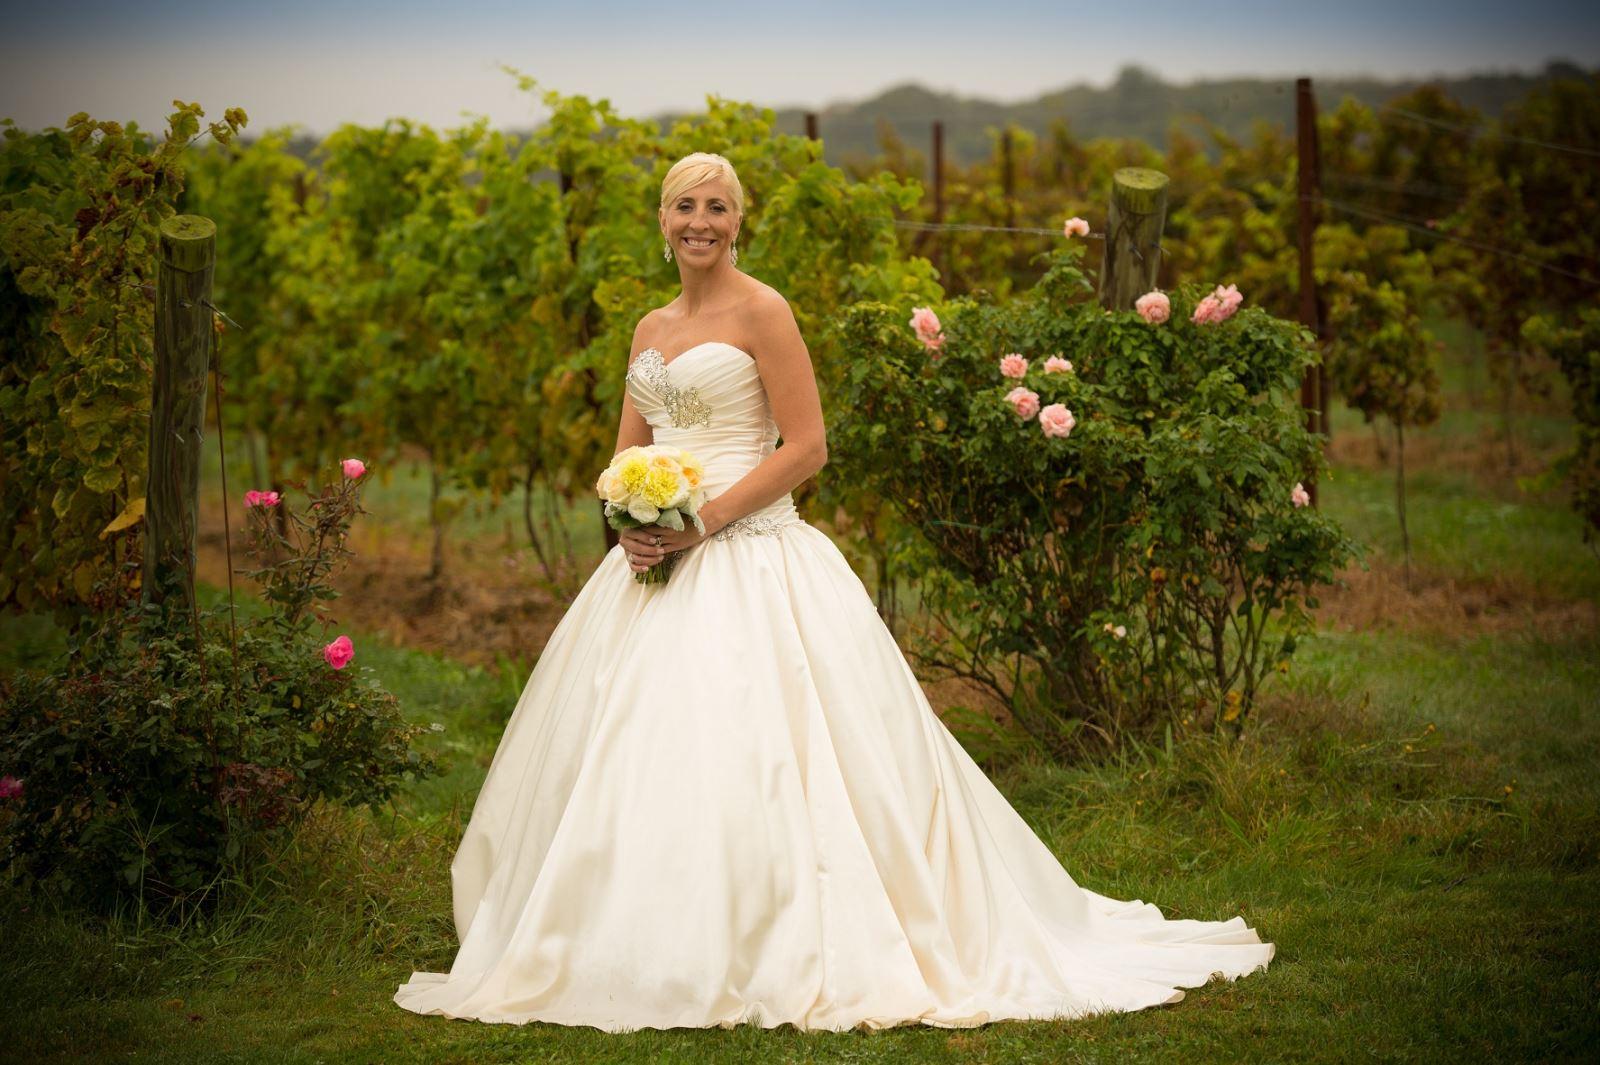 Danielle's Wedding Dress Preservation In Connecticut